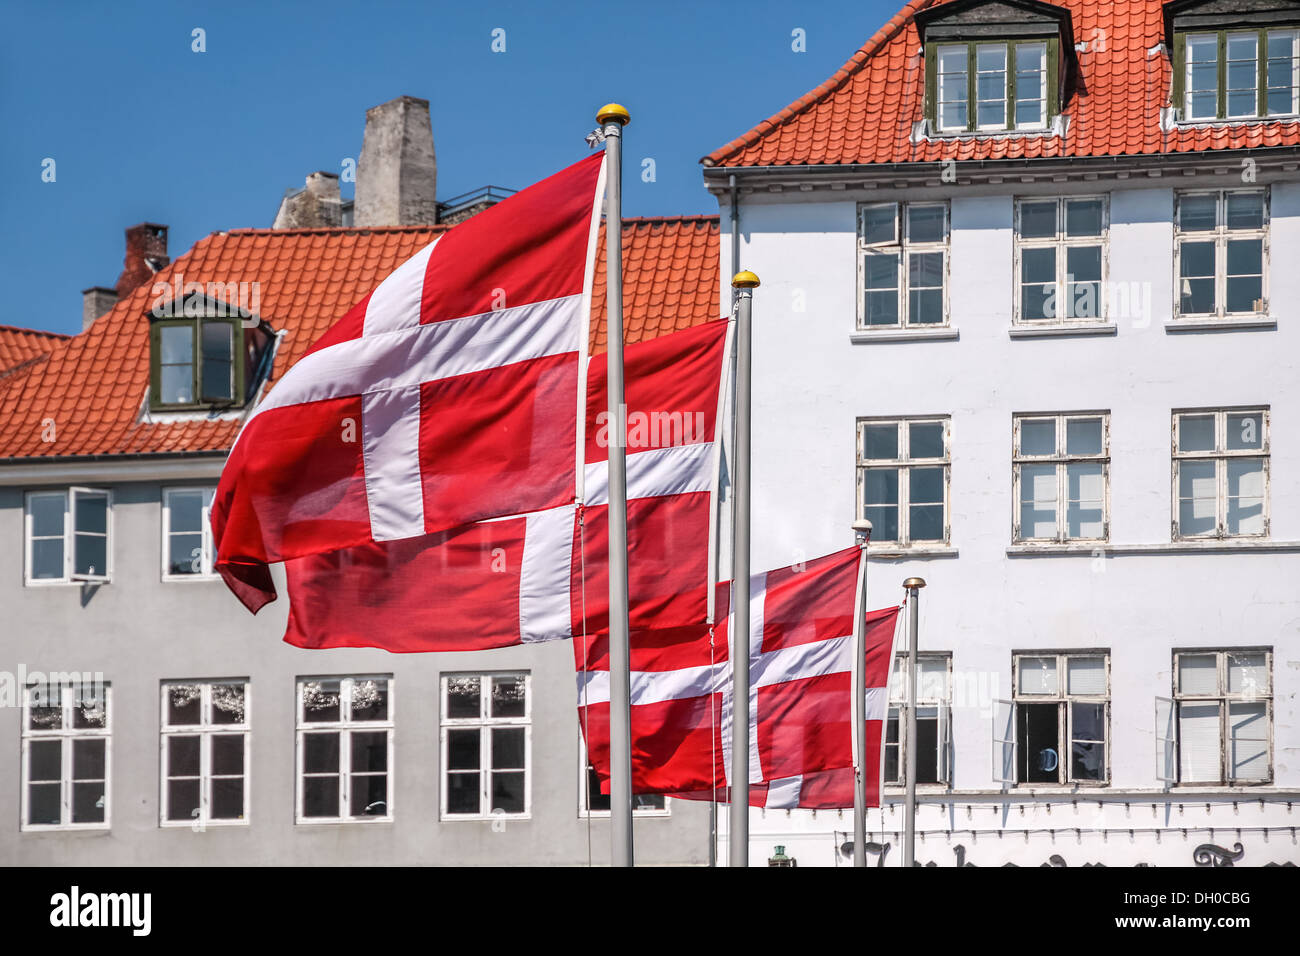 Danish flag waving, in the Nyhavn district of Copenhagen, Denmark - Stock Image